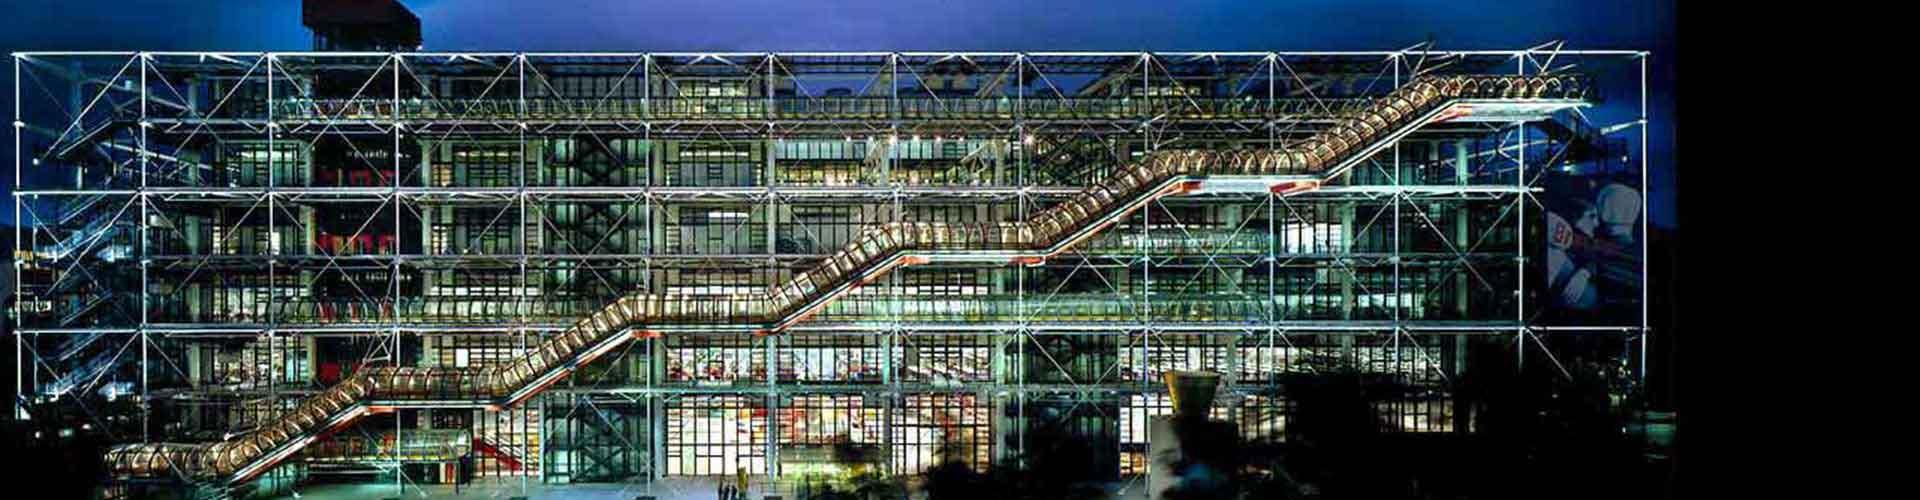 París - Hoteles baratos cerca a Centro Pompidou. Mapas de París, Fotos y comentarios de cada Hotel en París.